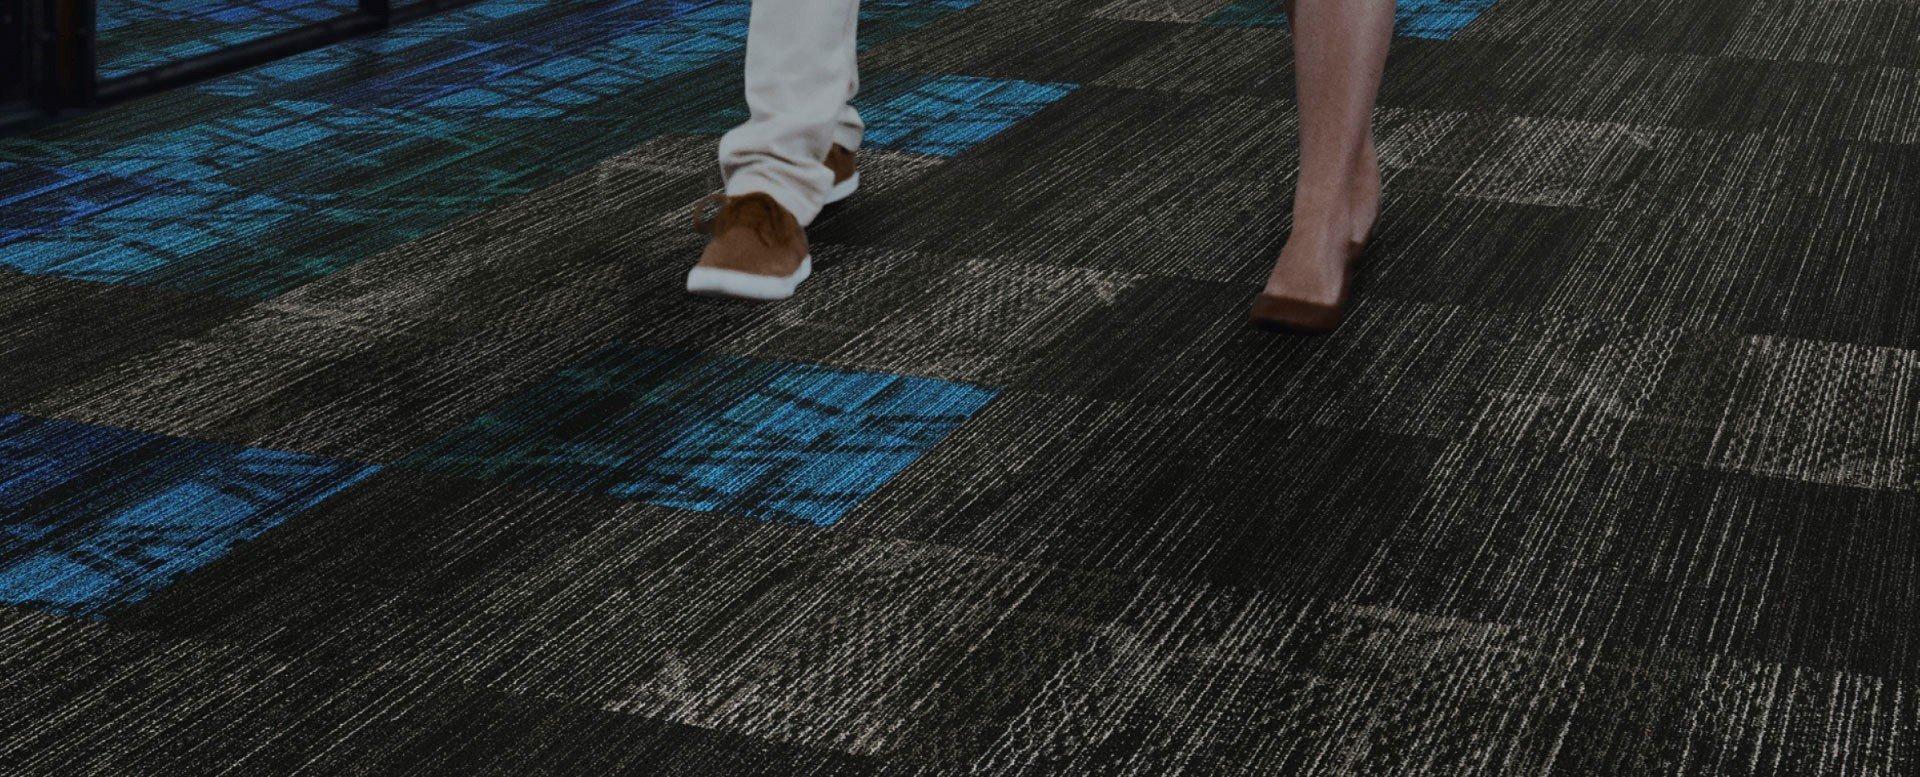 Milliken Blog Image - Carpet